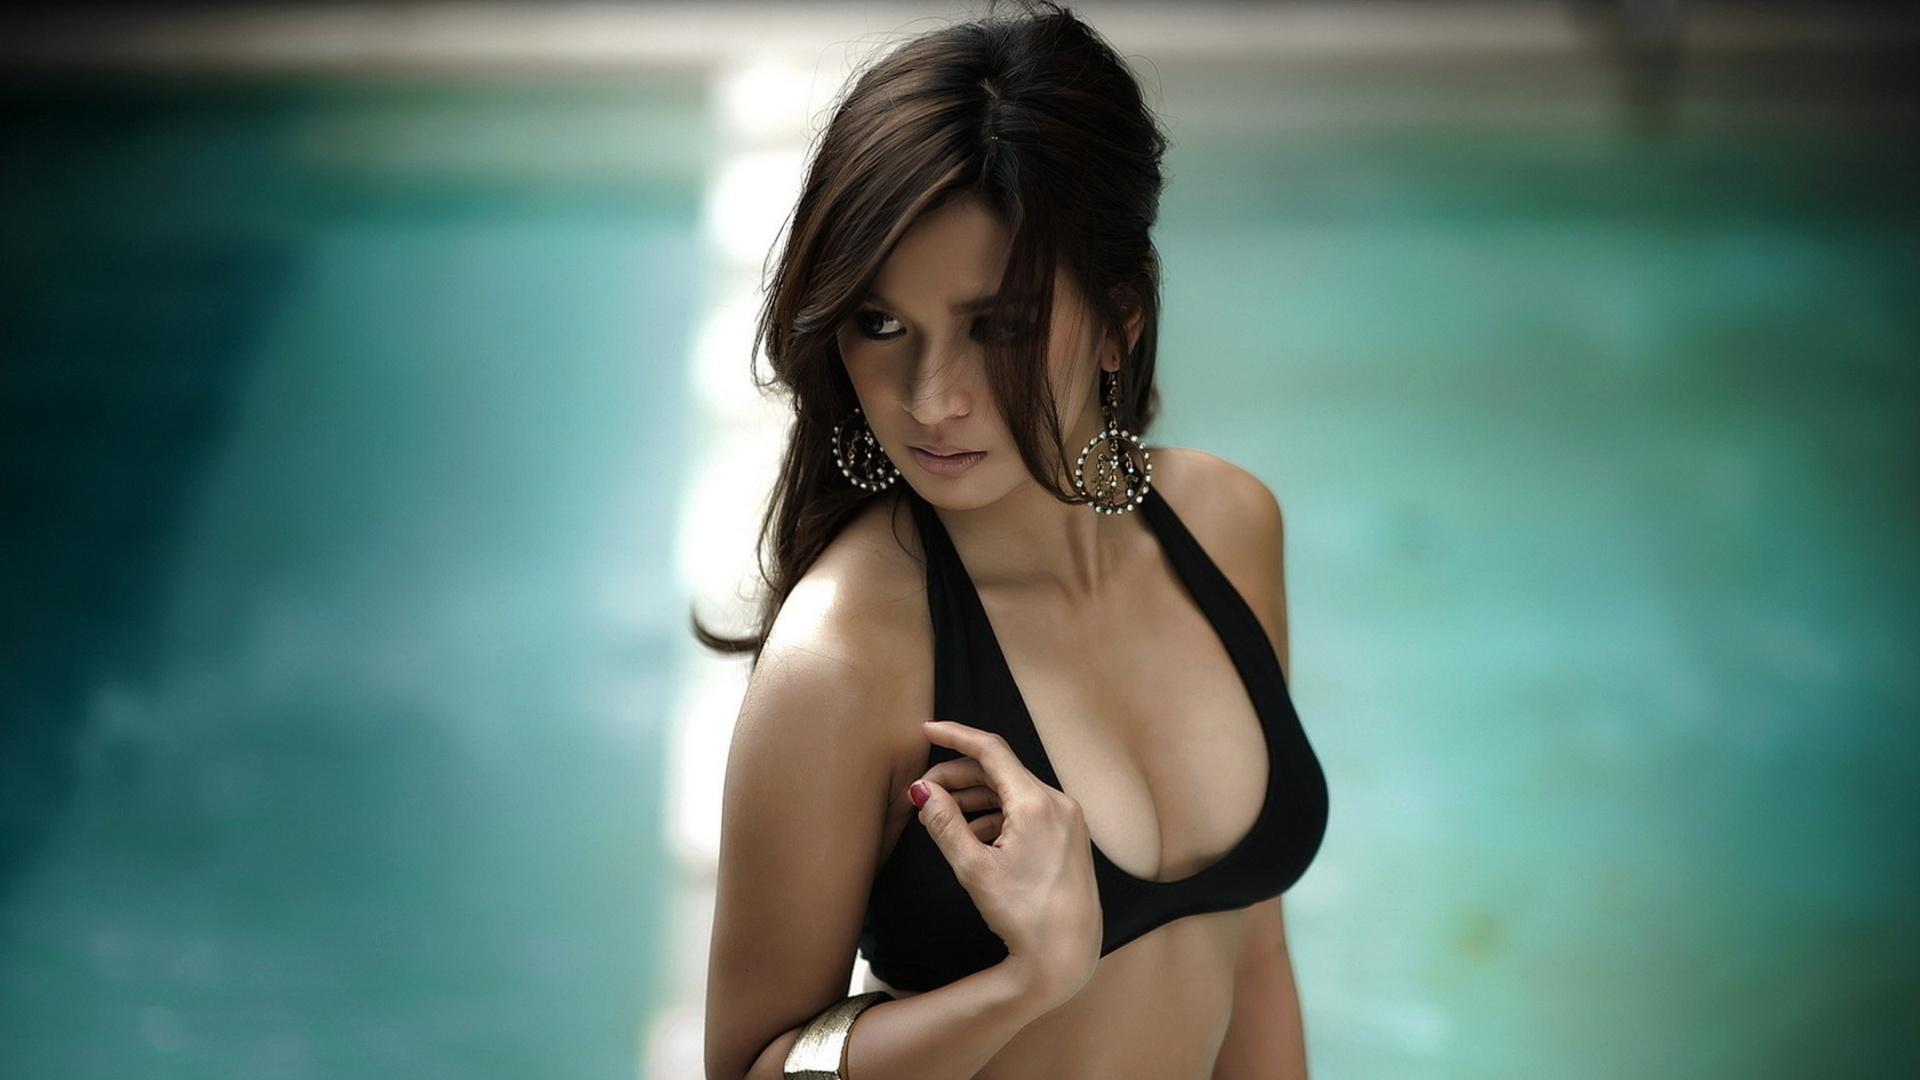 golaya-dzhordan-karver-topless